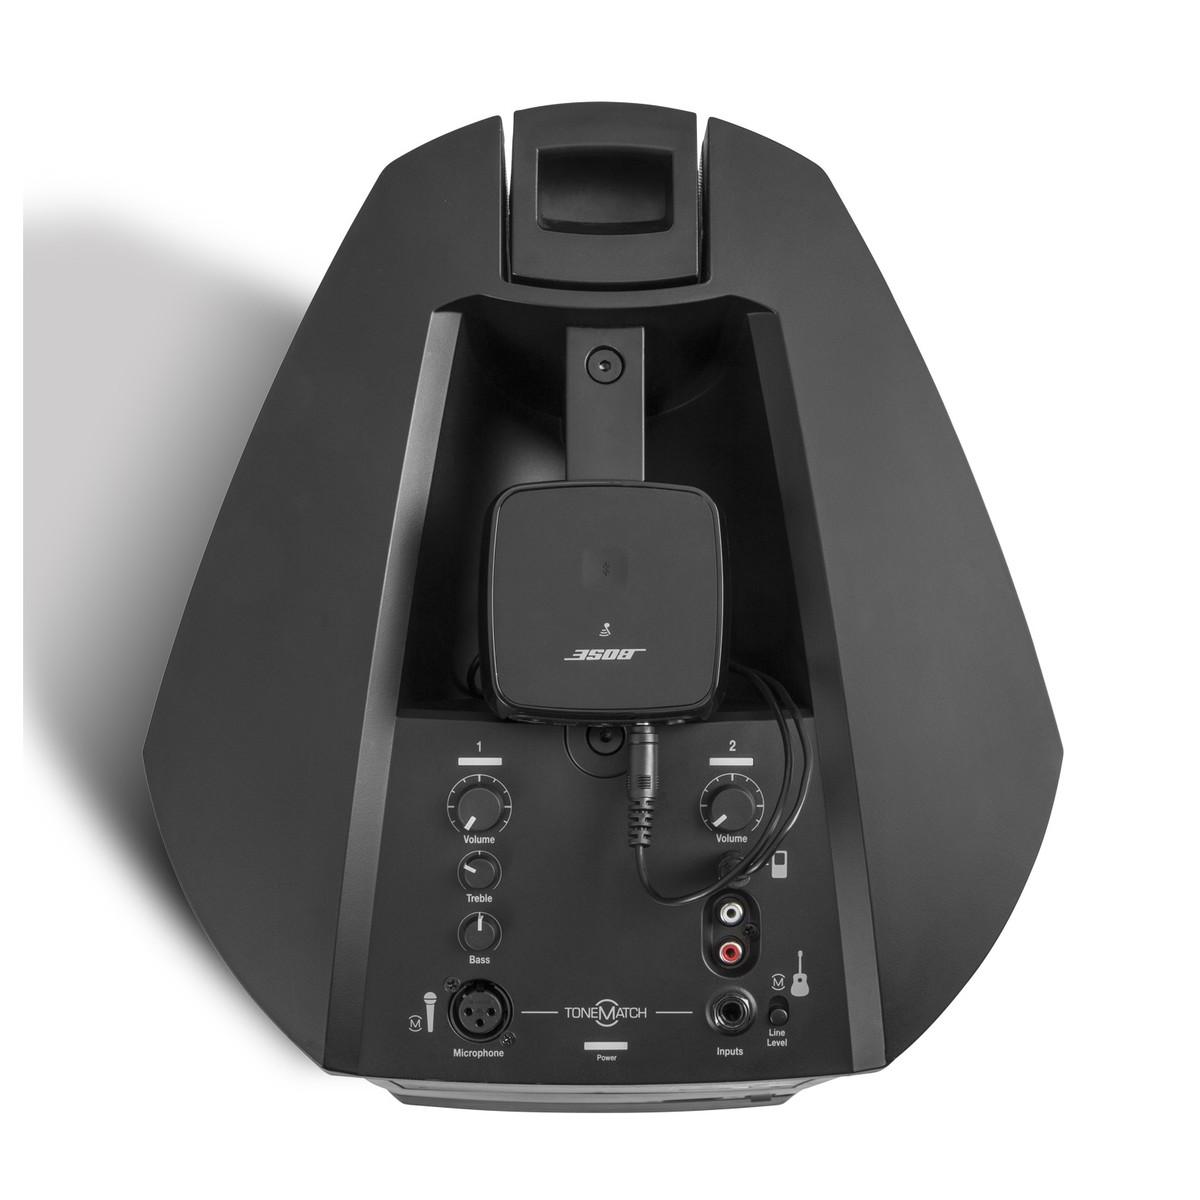 Bose Mobile Onear Headset Pinout Diagram Pinoutsguidecom